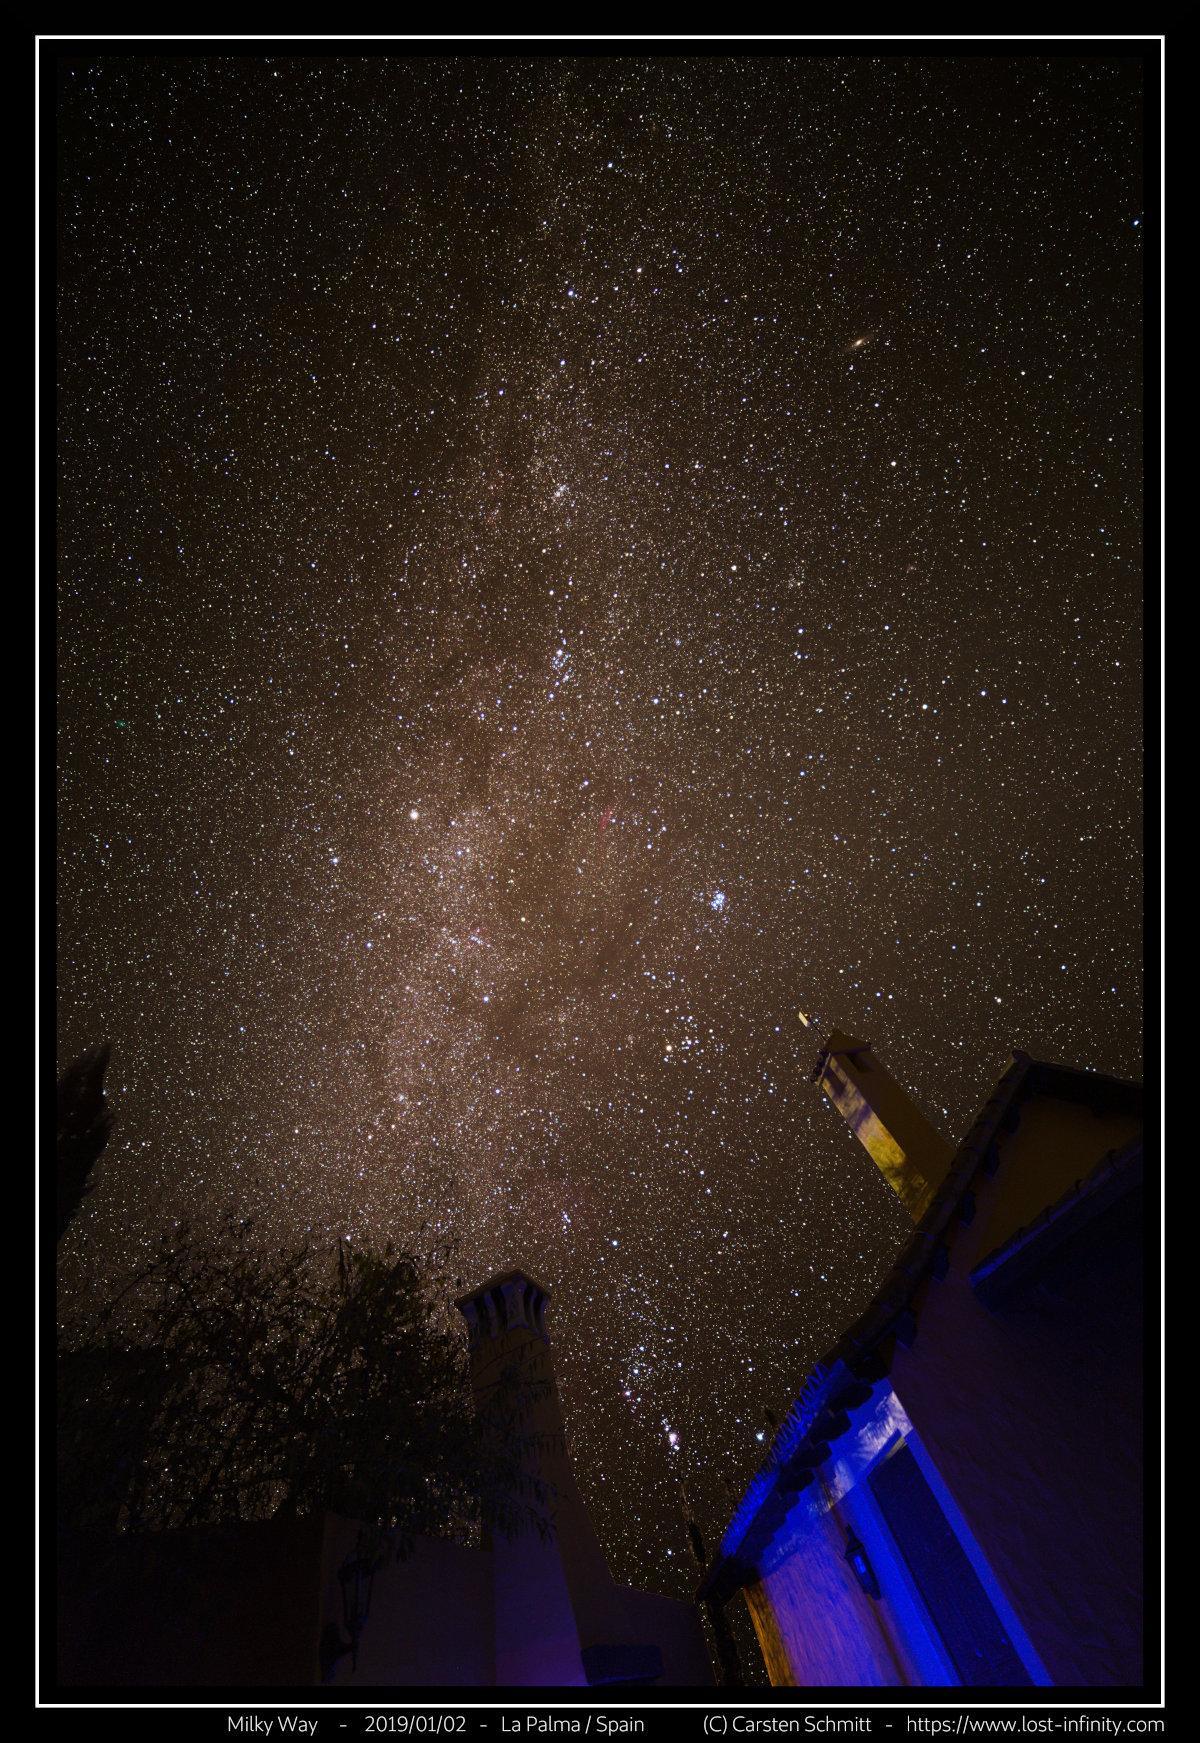 Milky Way - 2019/02/01